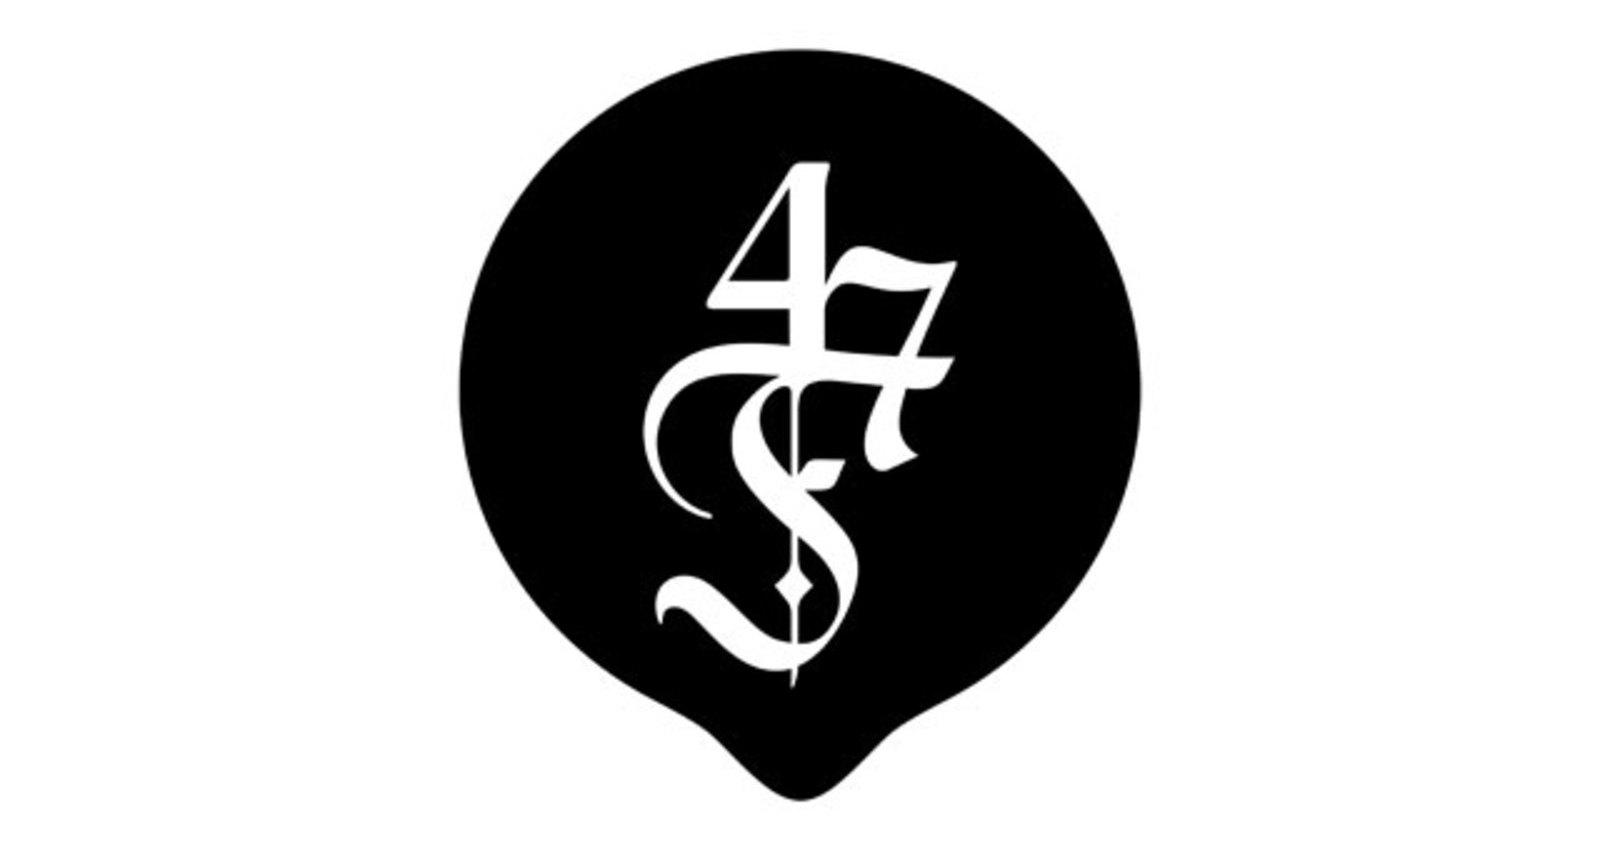 Fonderie 47 Identity